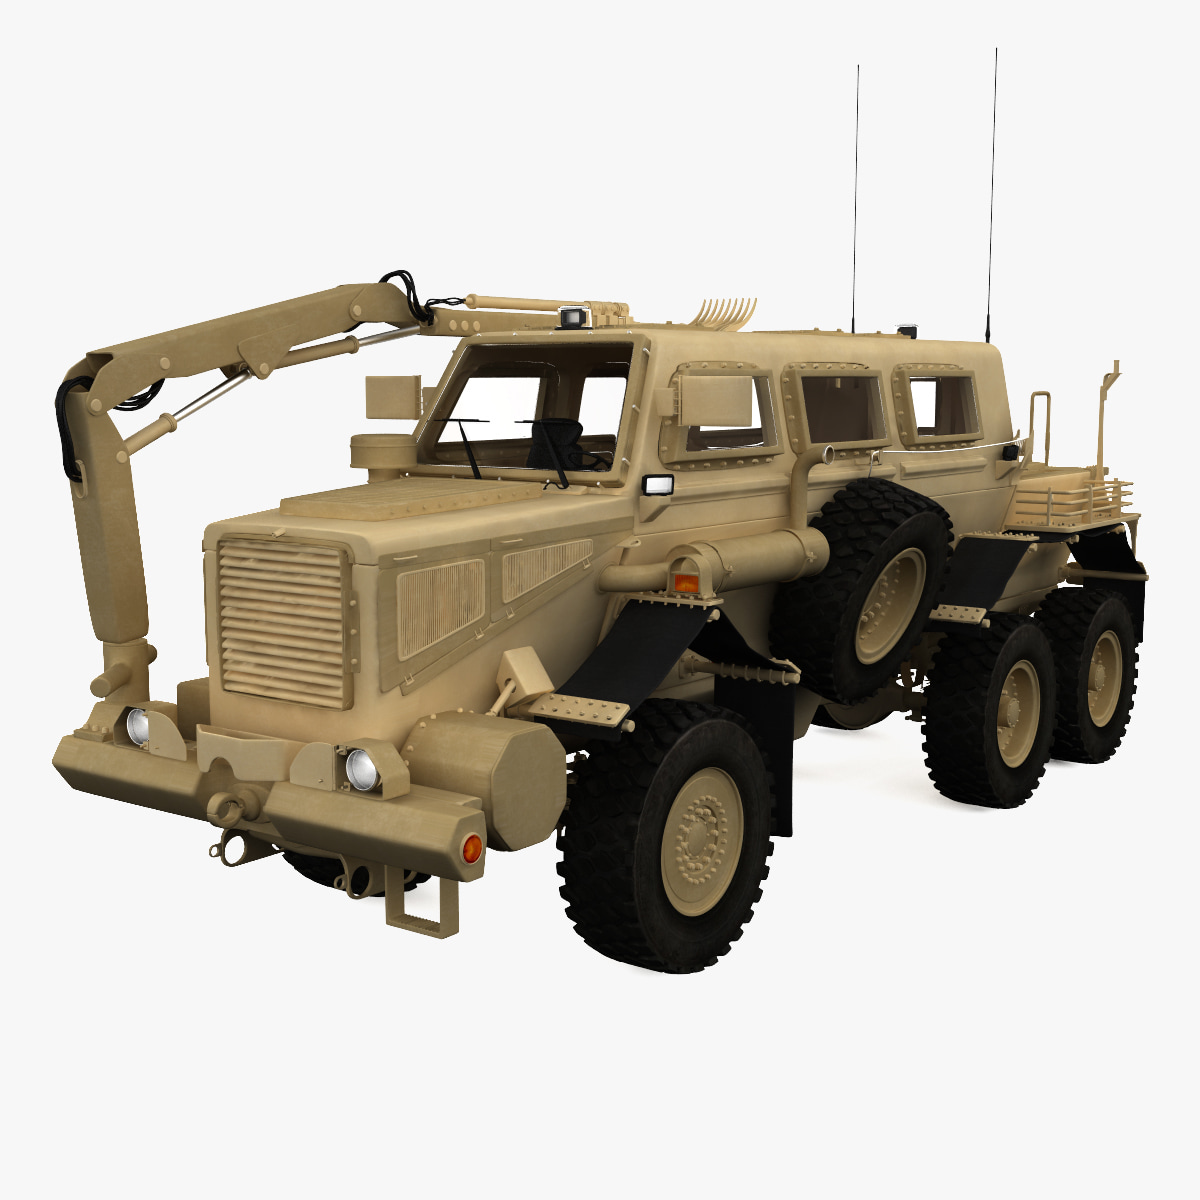 Buffalo_Mine_Protected_Vehicle_00.jpg